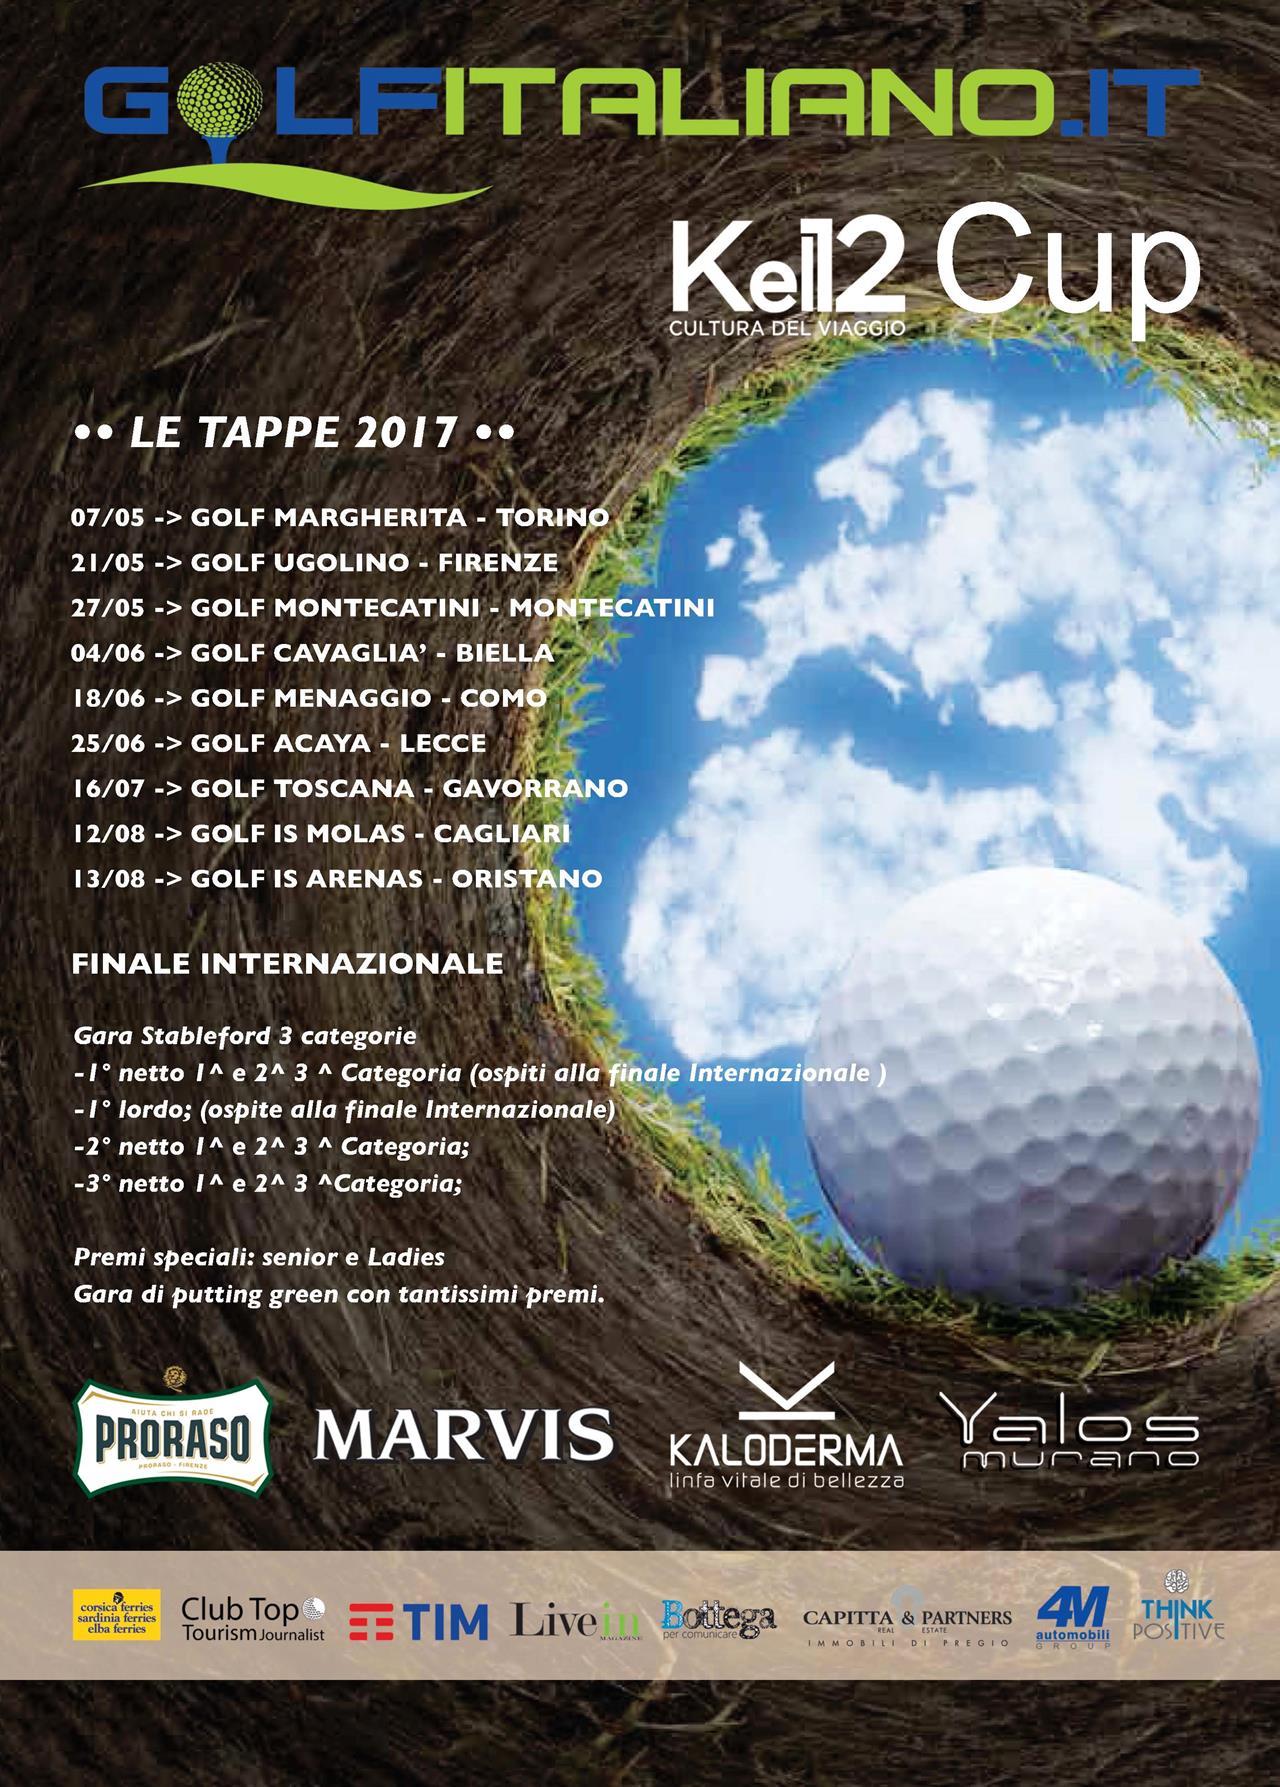 Kel 12 Calendario Viaggi.Golfitaliano Kel 12 Cup